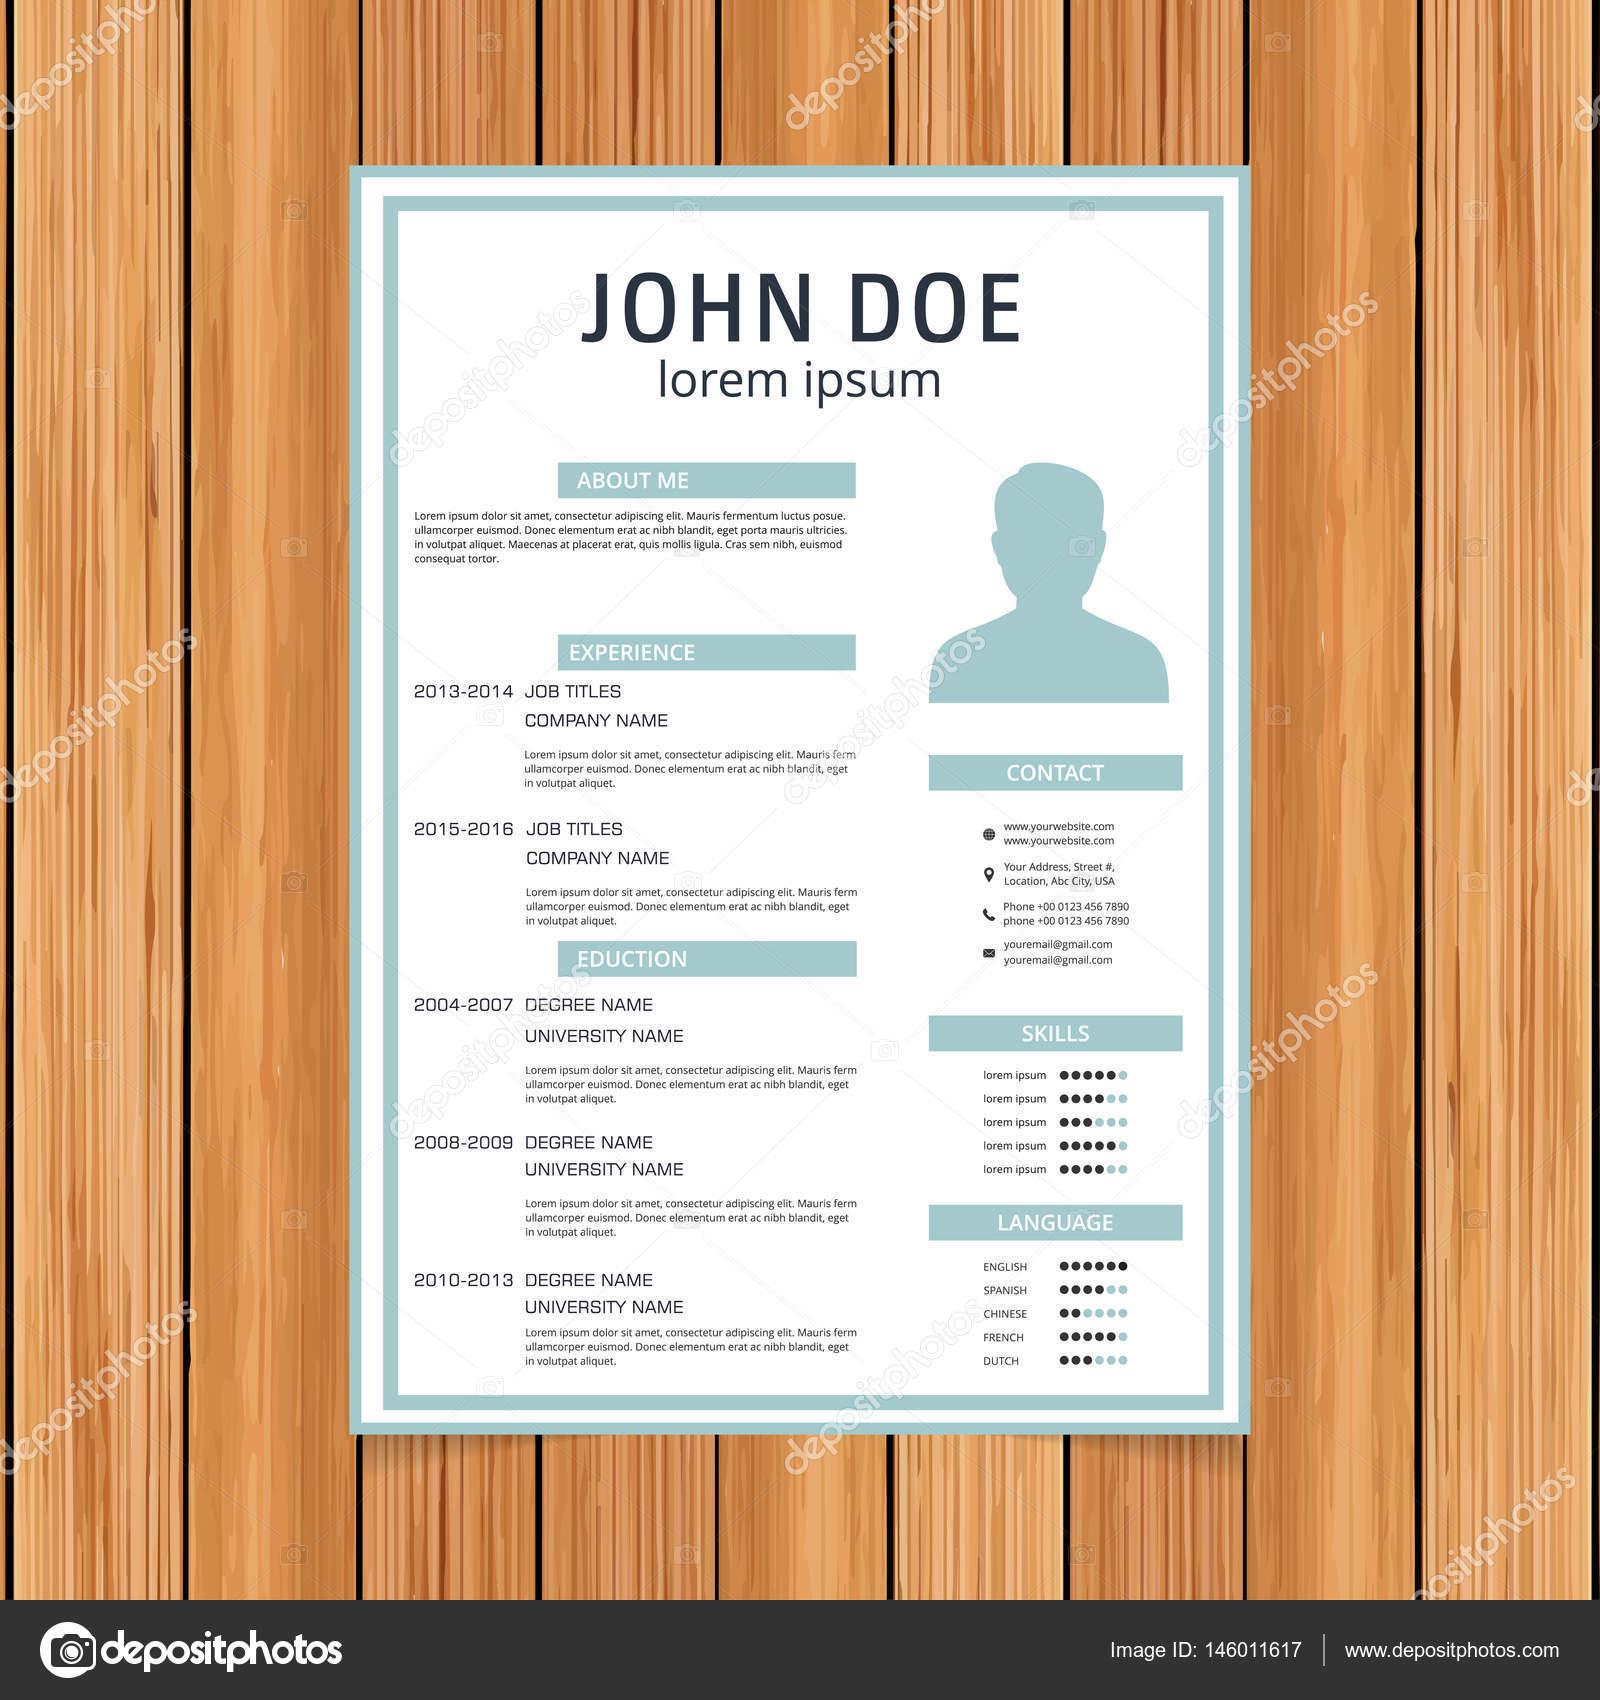 Plantilla de curriculum vitae para solicitudes de empleo — Archivo ...